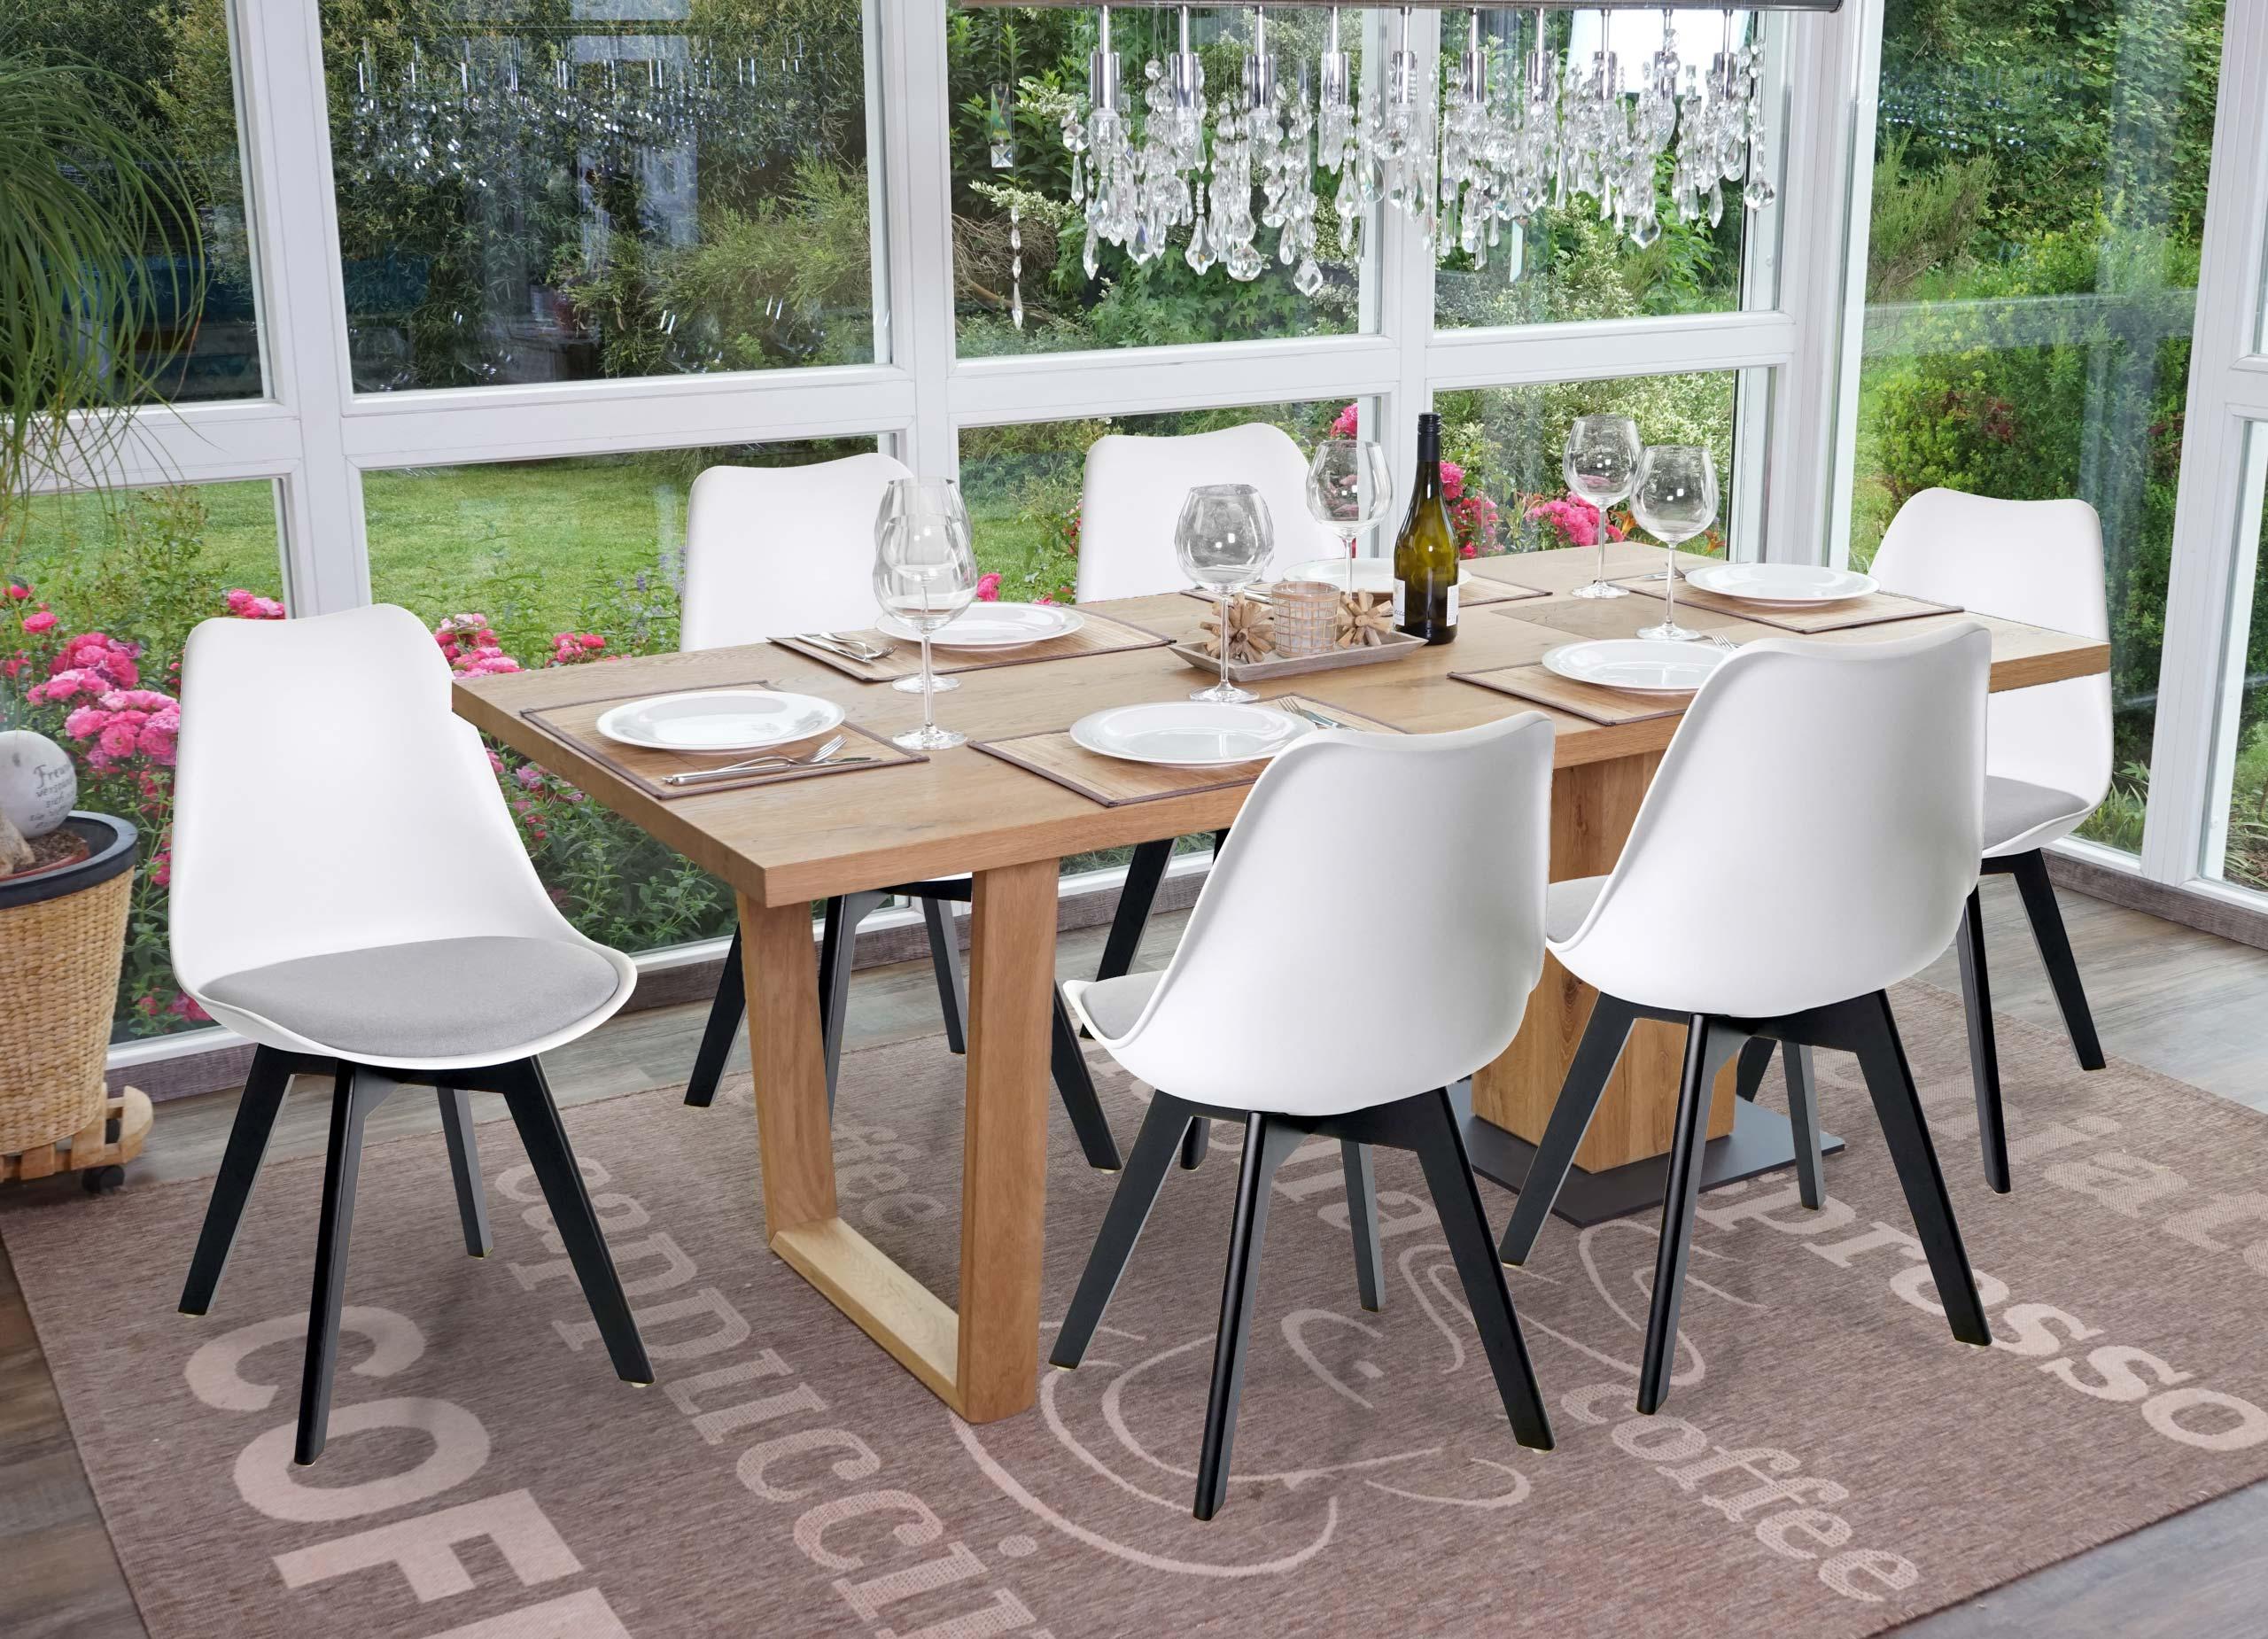 6x Esszimmerstuhl HWC E53 Stuhl Küchenstuhl Retro Design